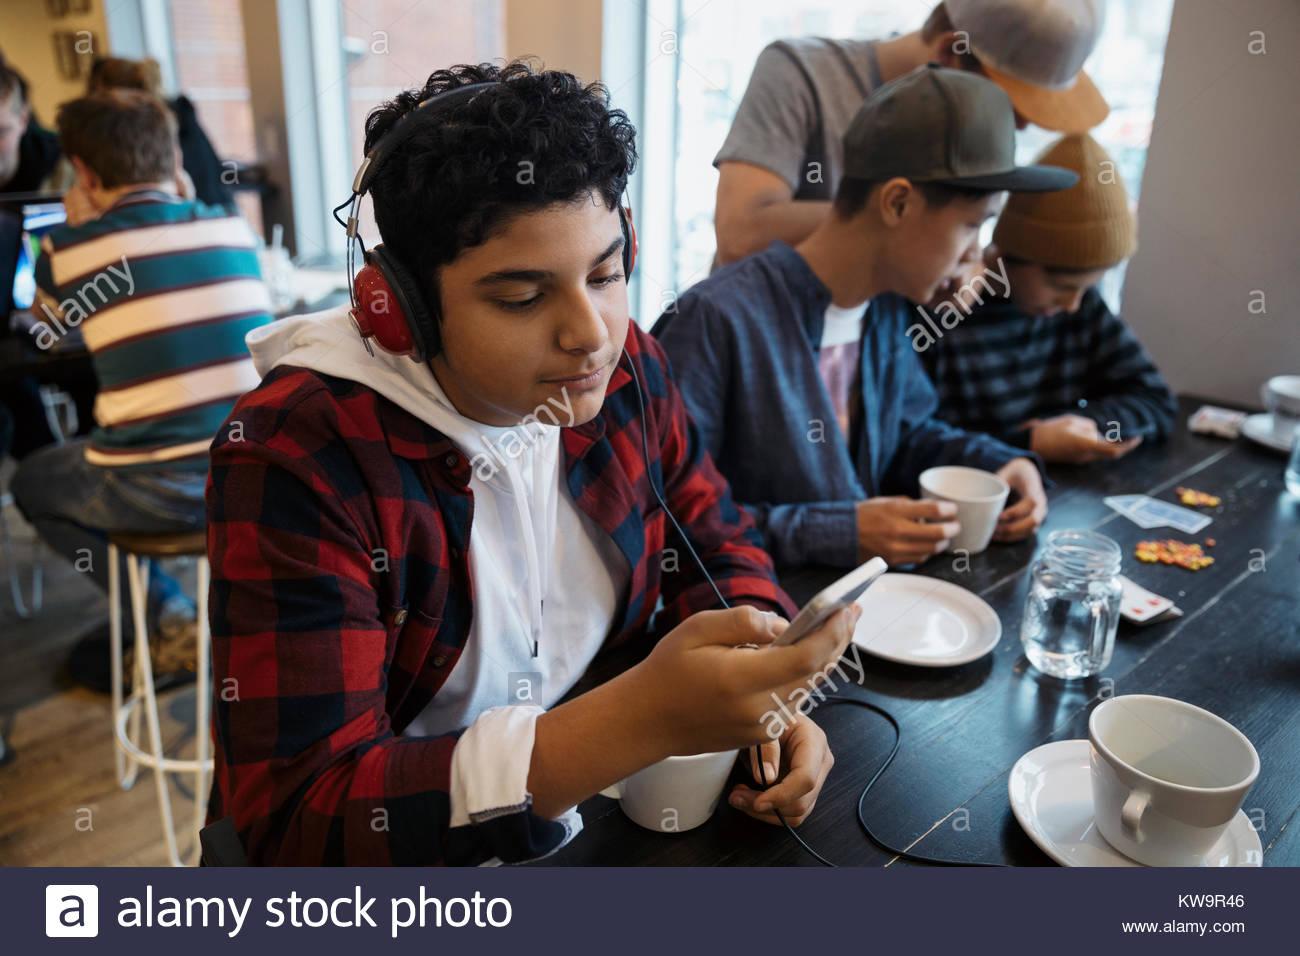 Interpolación de Oriente Medio muchacho con auriculares para escuchar música con el teléfono inteligente Imagen De Stock